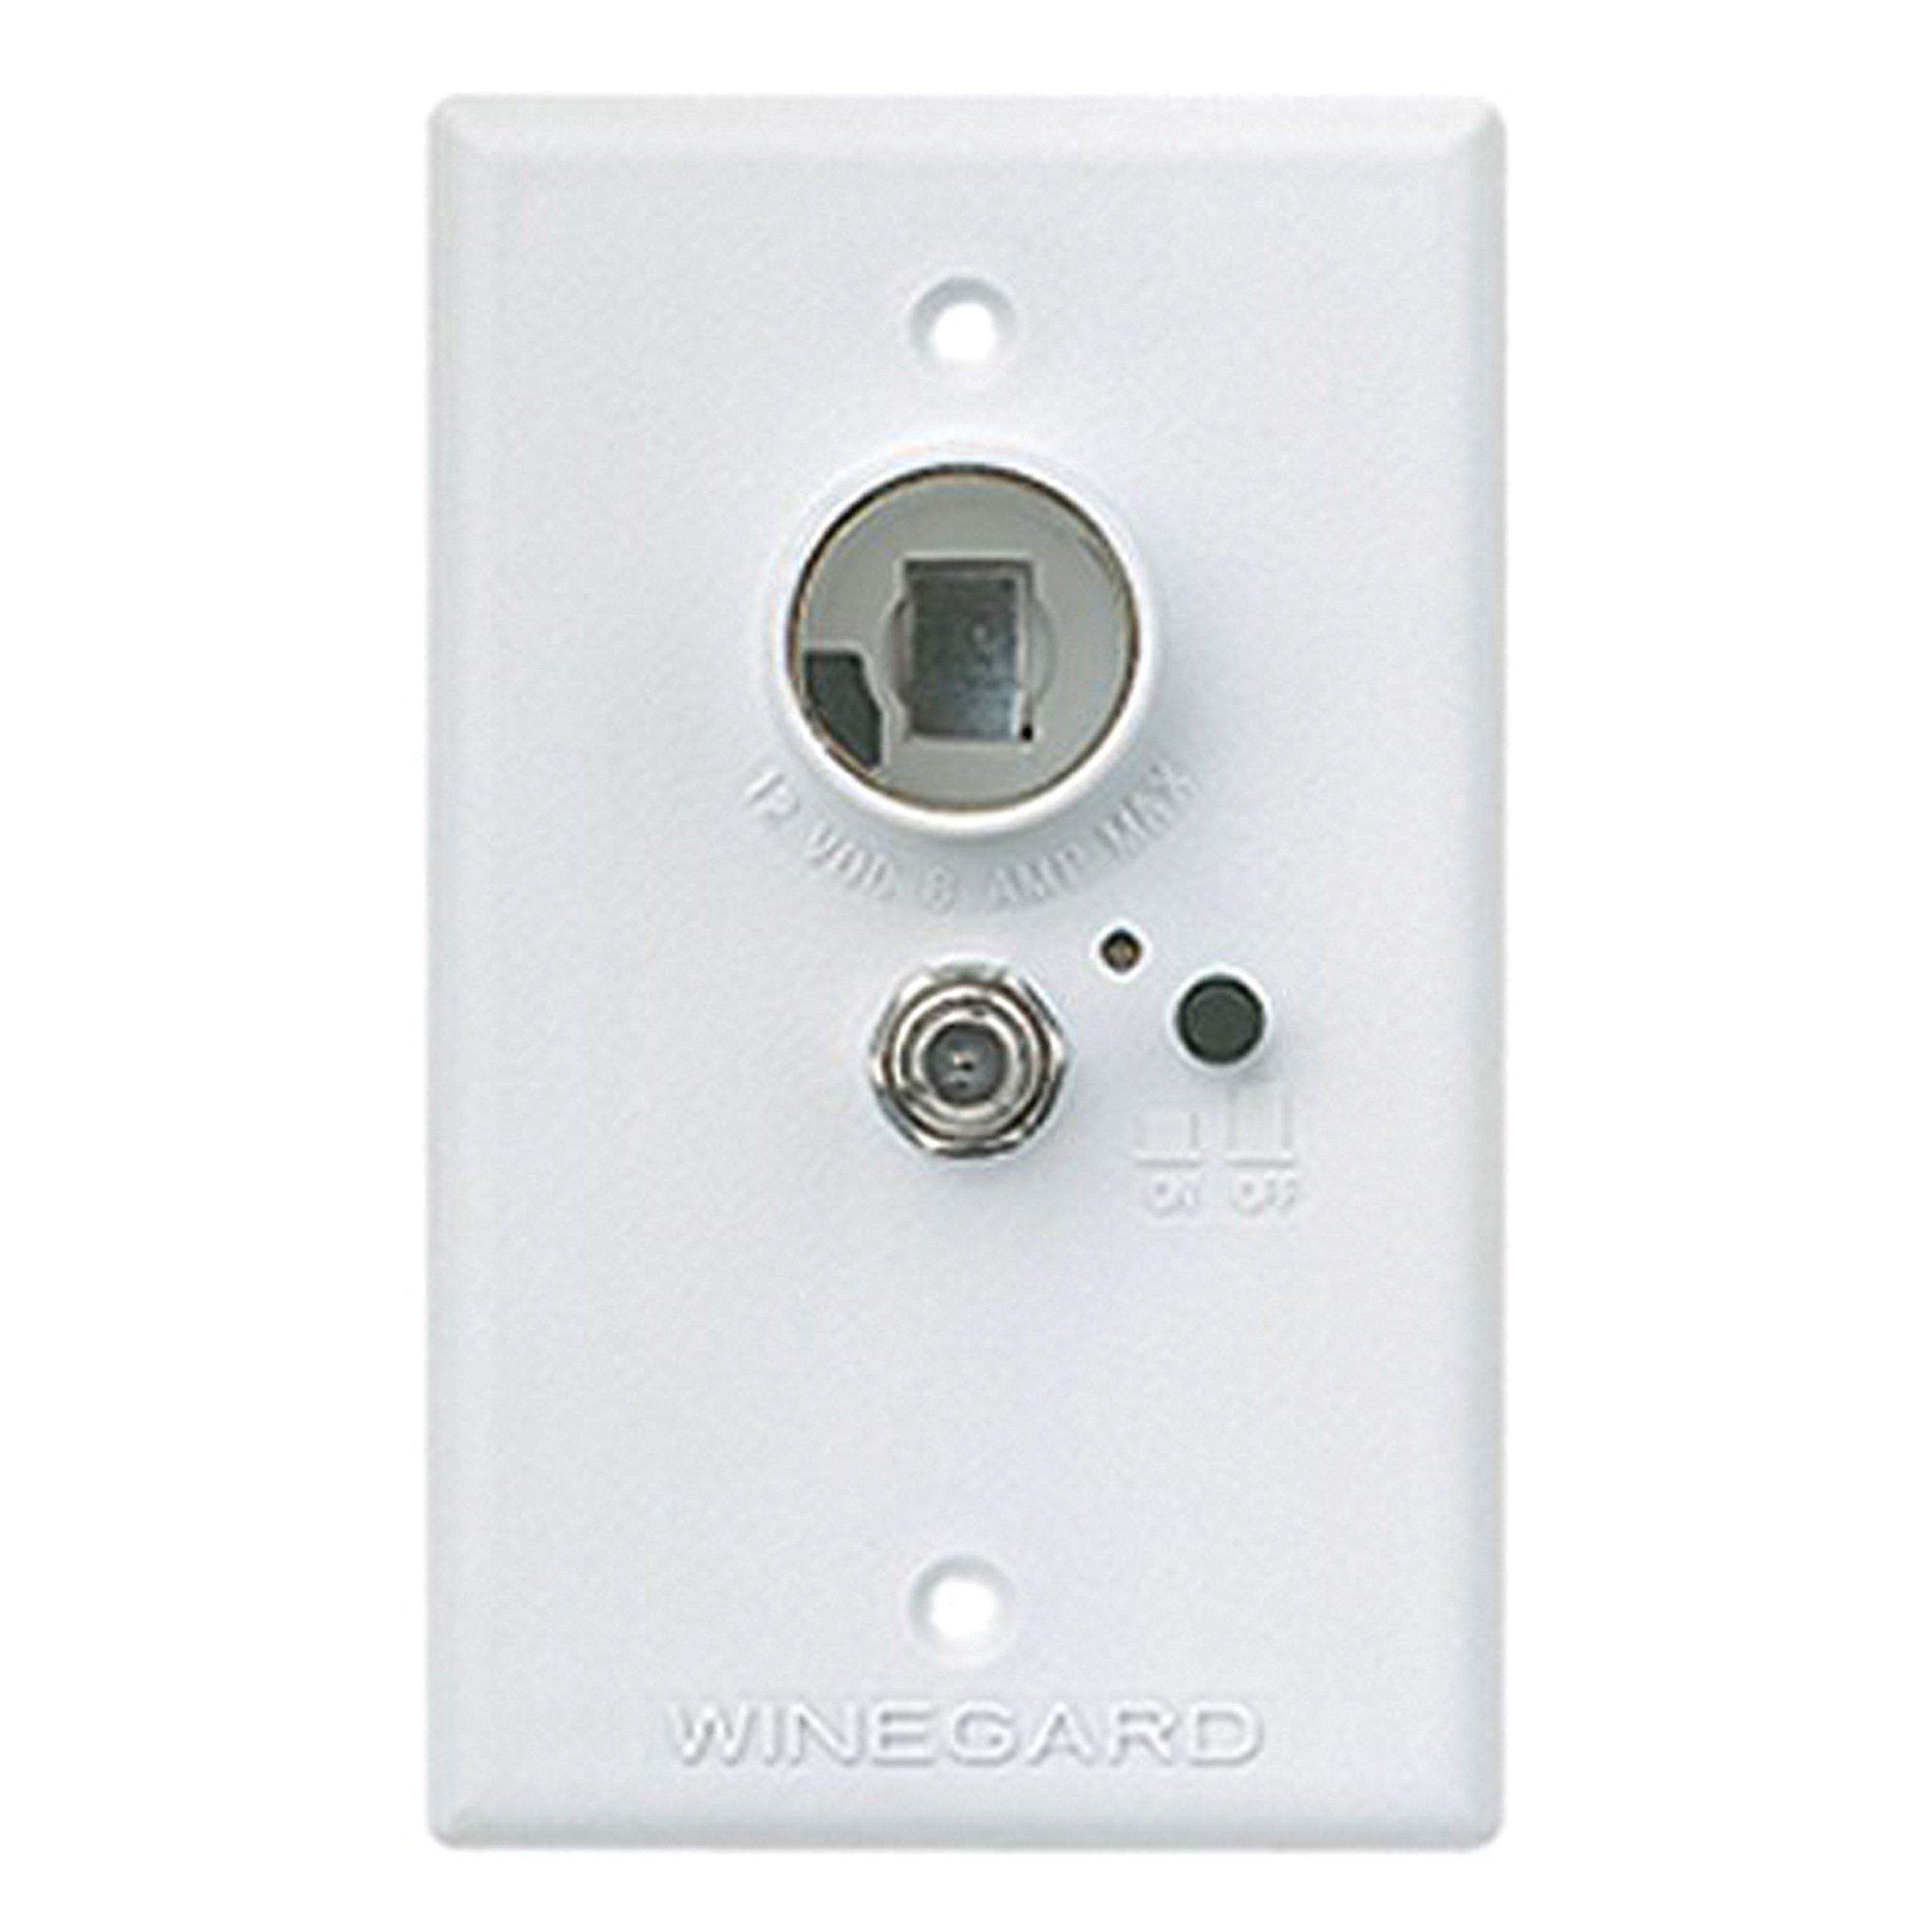 Winegard 18 9847 RA 7296 Signal Amplifier White